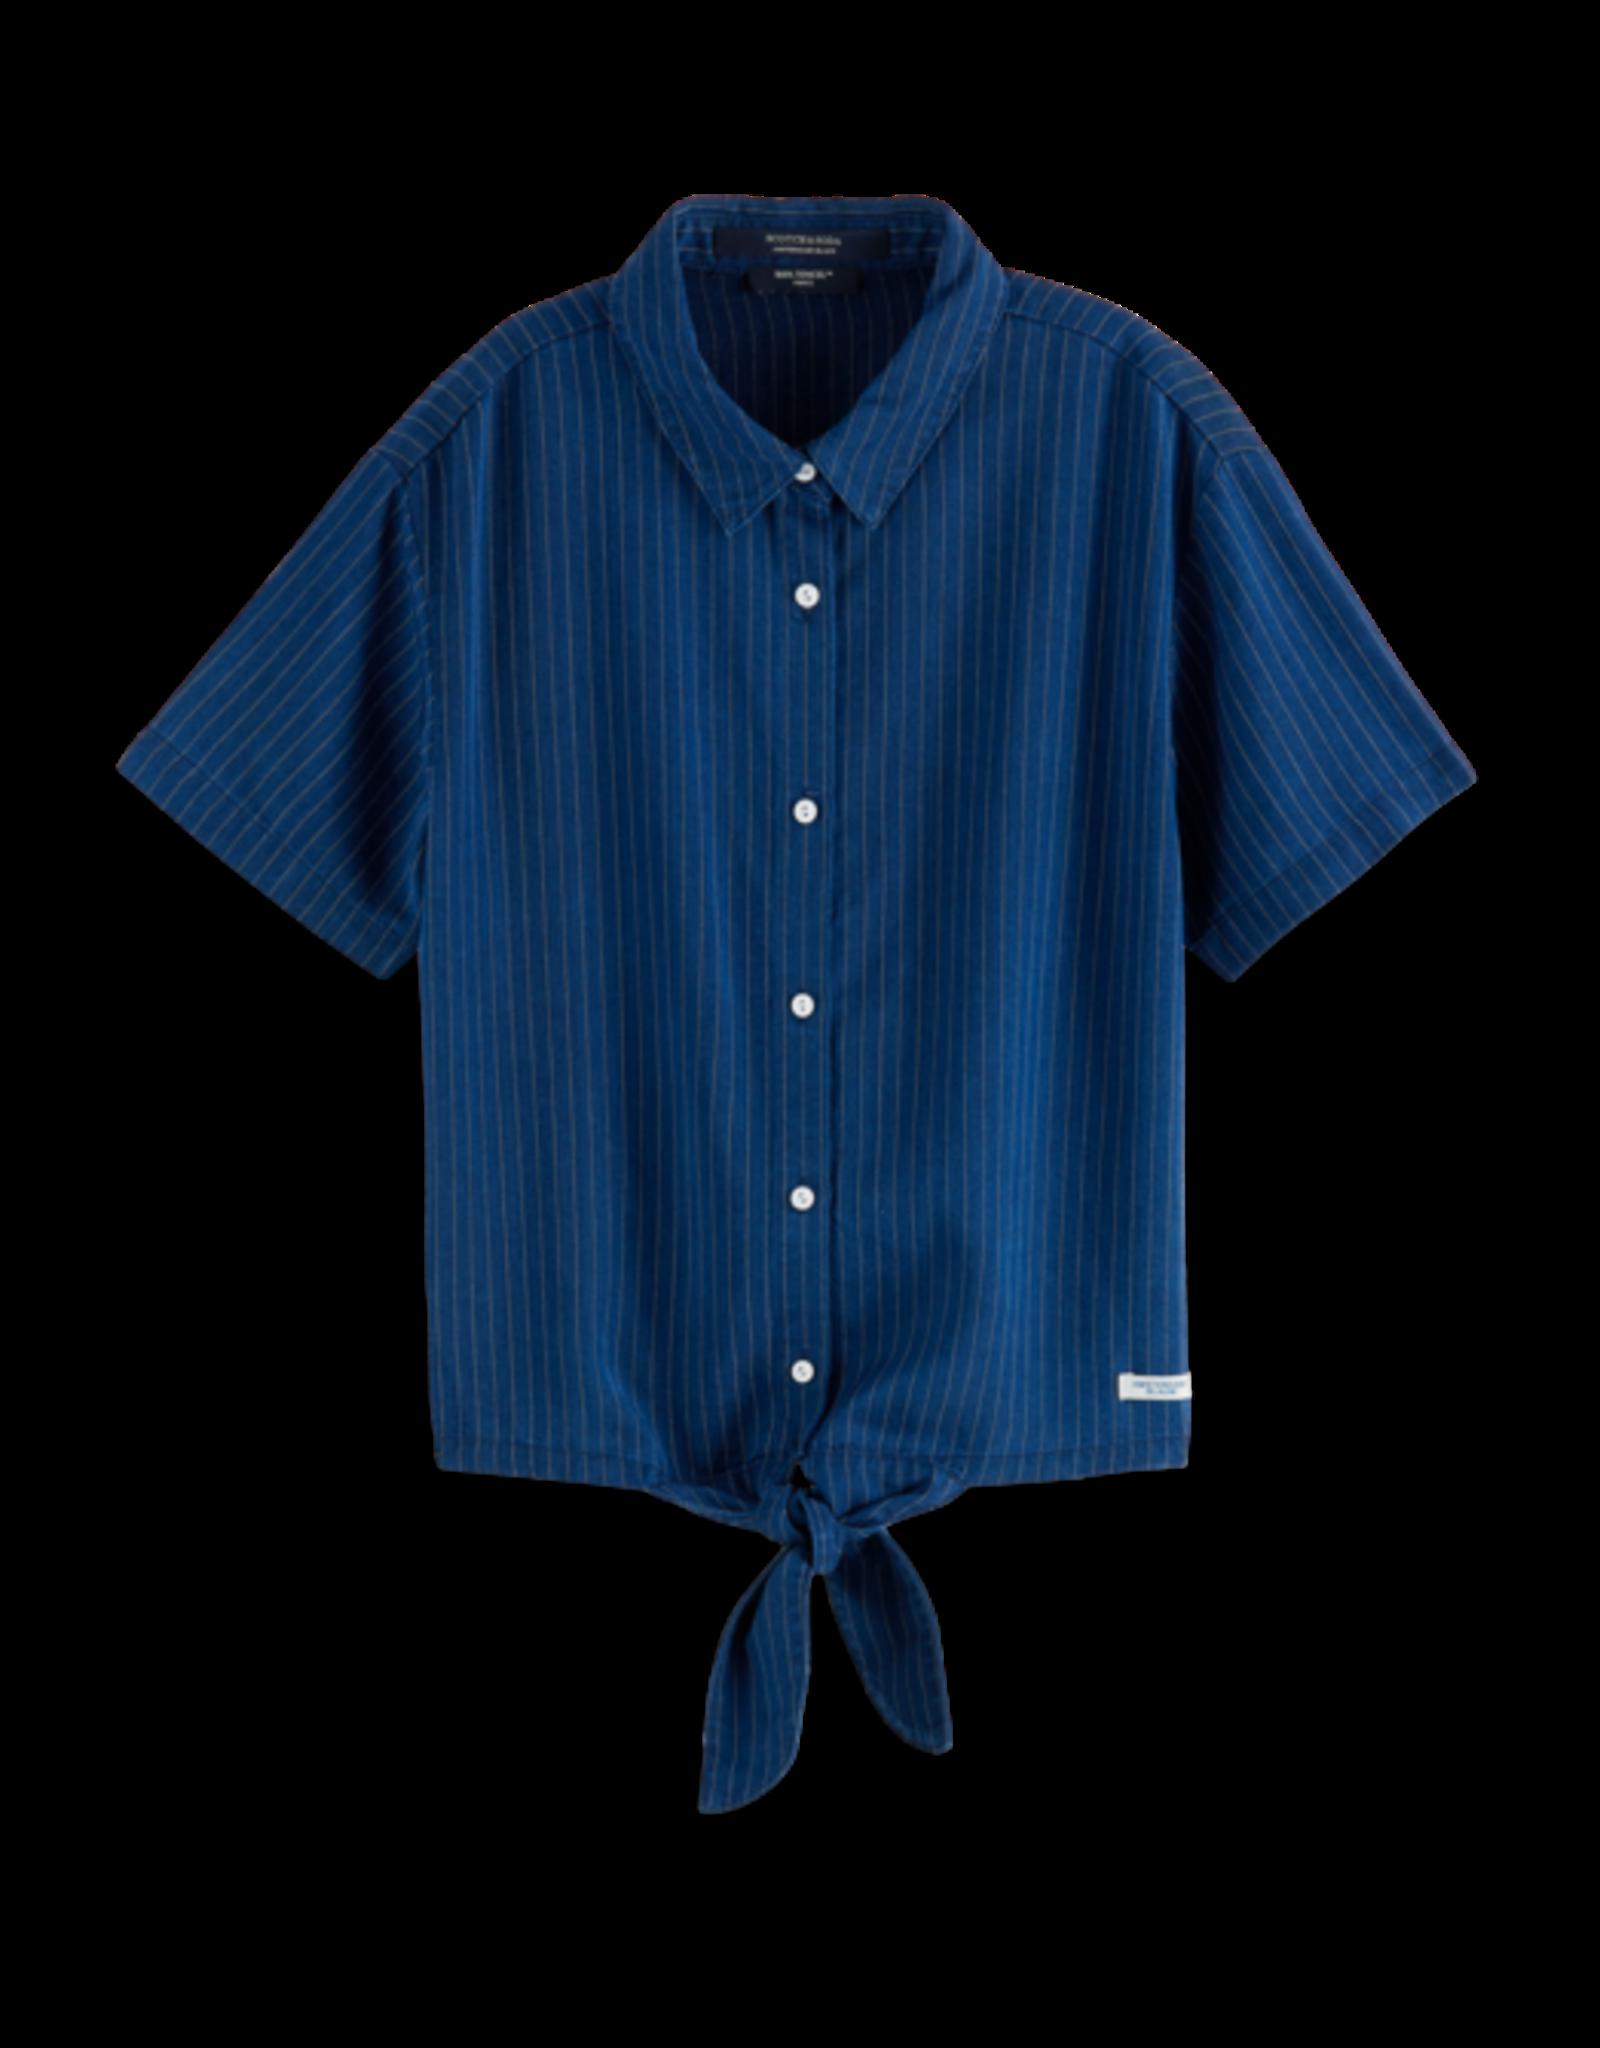 Scotch&Soda Scotch&Soda PF21 162645 Ams blauw shirt